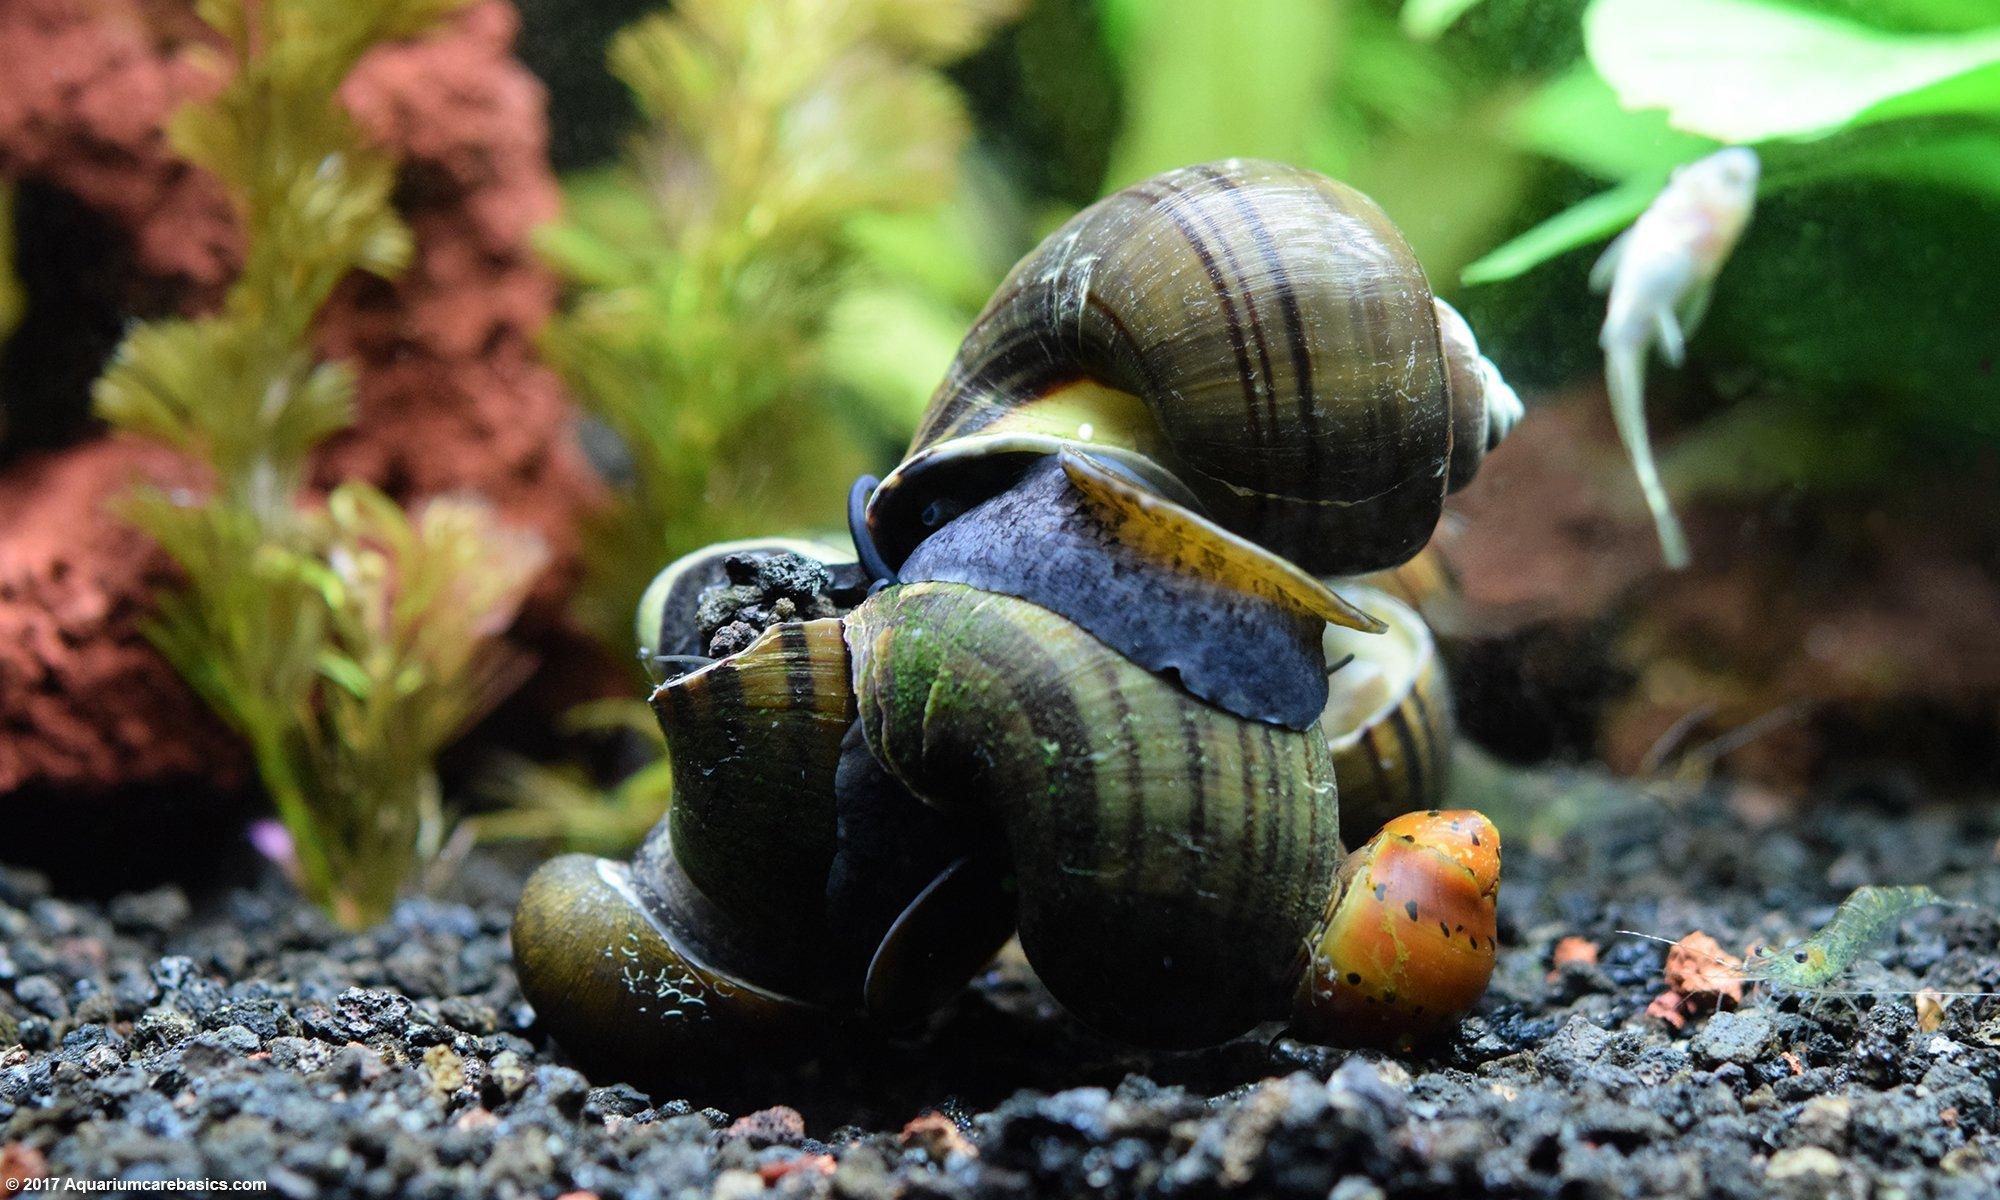 Pond freshwater snails